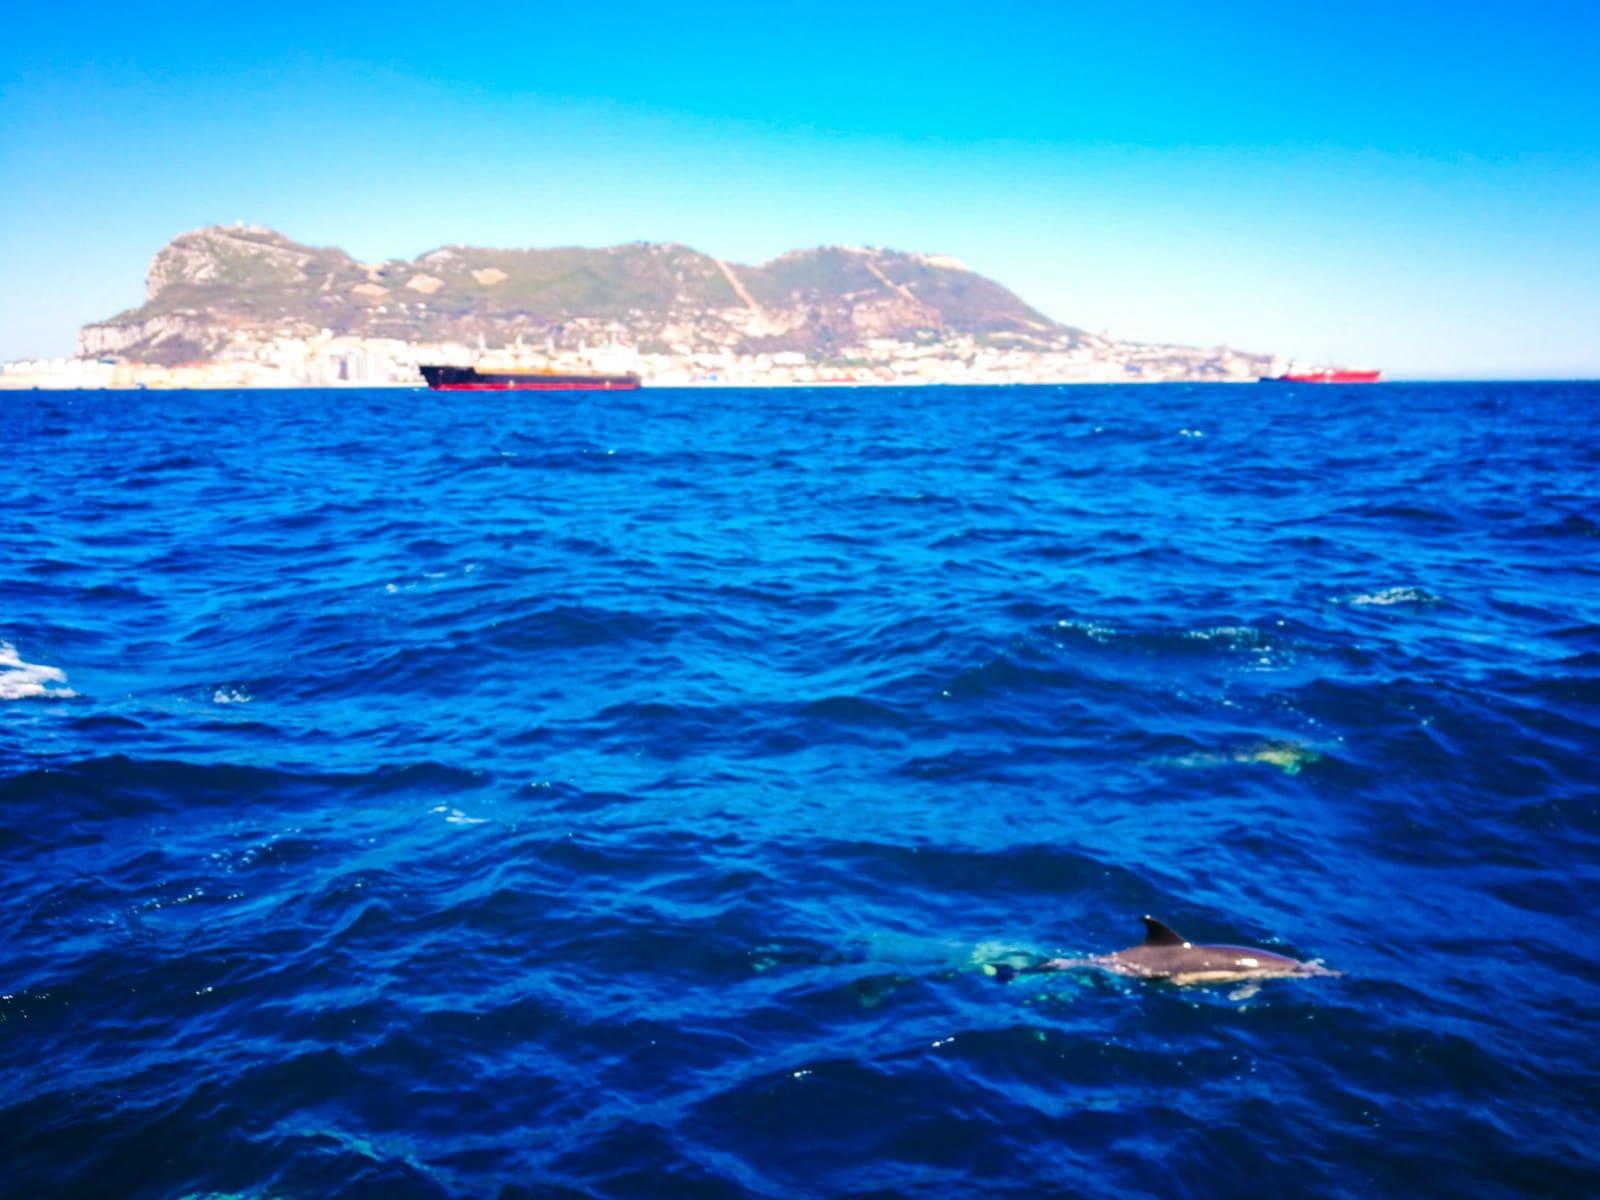 23-jun-2019-blogueros-espaoles-de-viajes-visitan-el-pen_48114498643_o